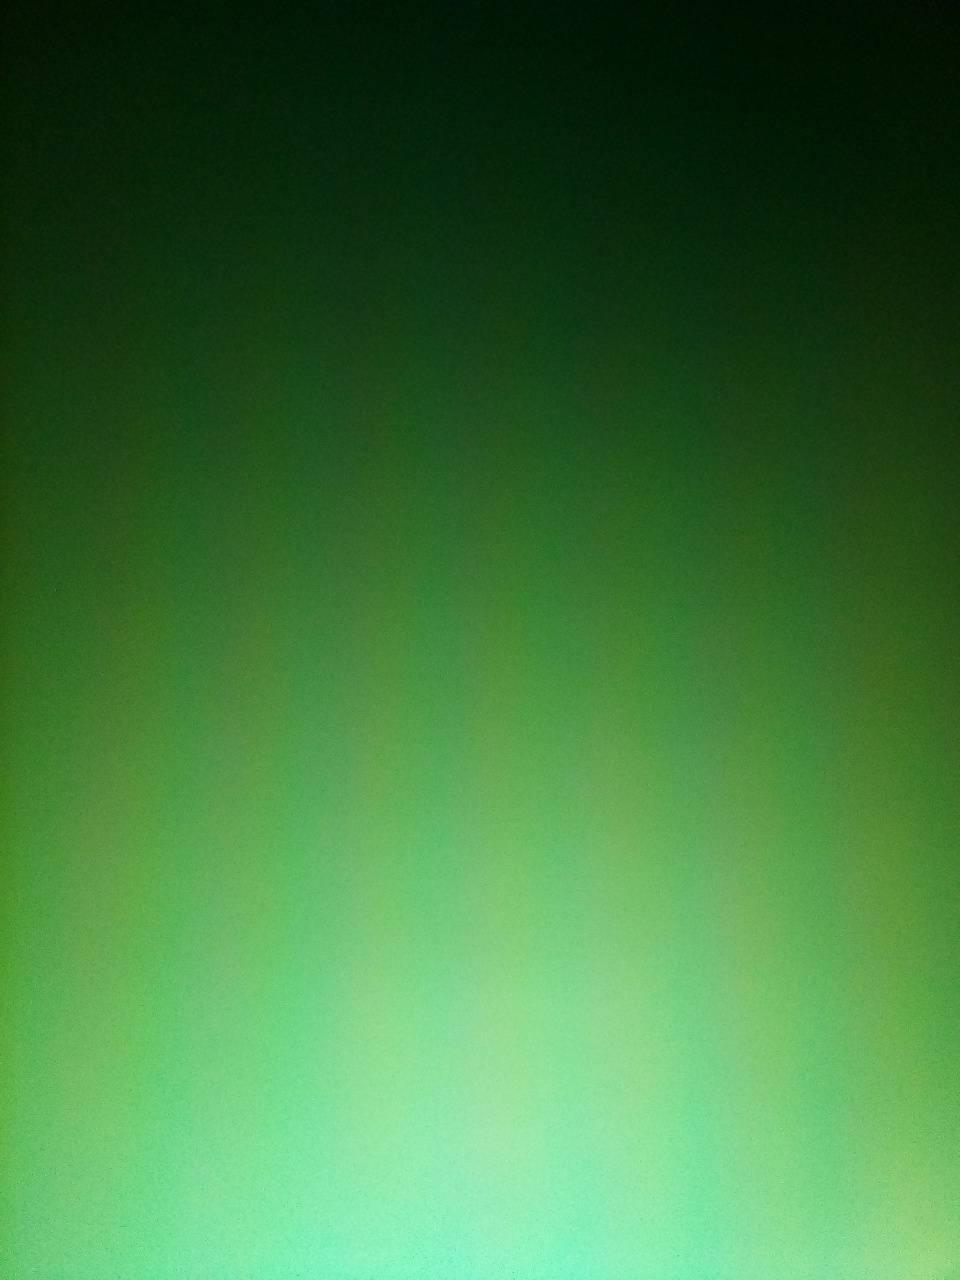 A green screen